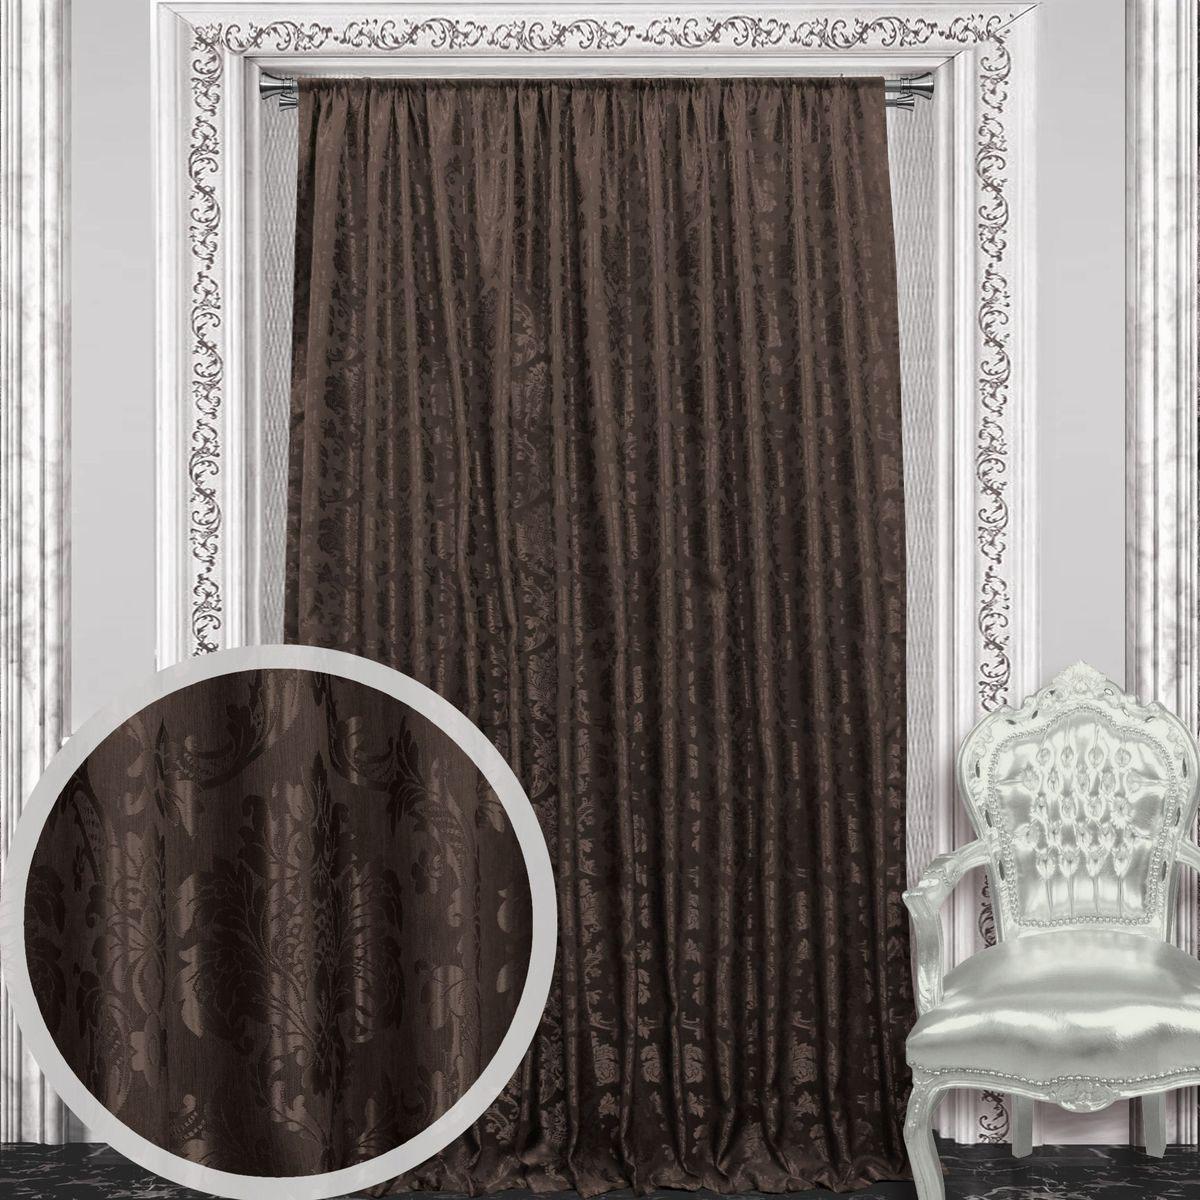 Штора Amore 200 х 270 см, 1 шт., цвет: коричневый. 8605386053